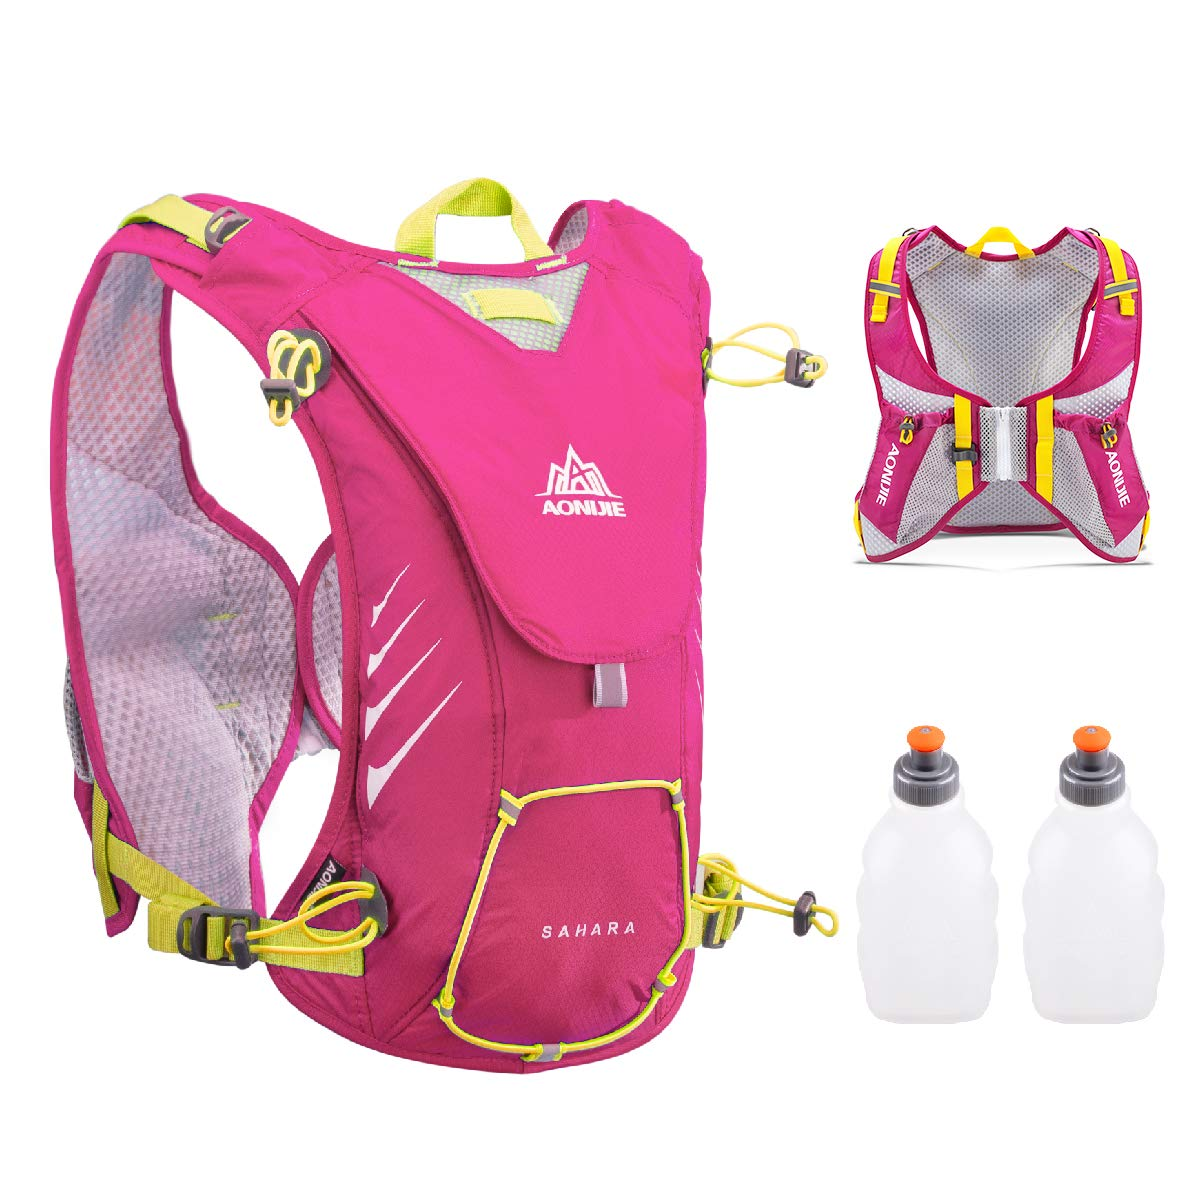 TRIWONDER 8L Hydration Vest for Outdoors Mochilas Trail Marathoner Running Race Hydration Pack Backpack fits Women Men Kids